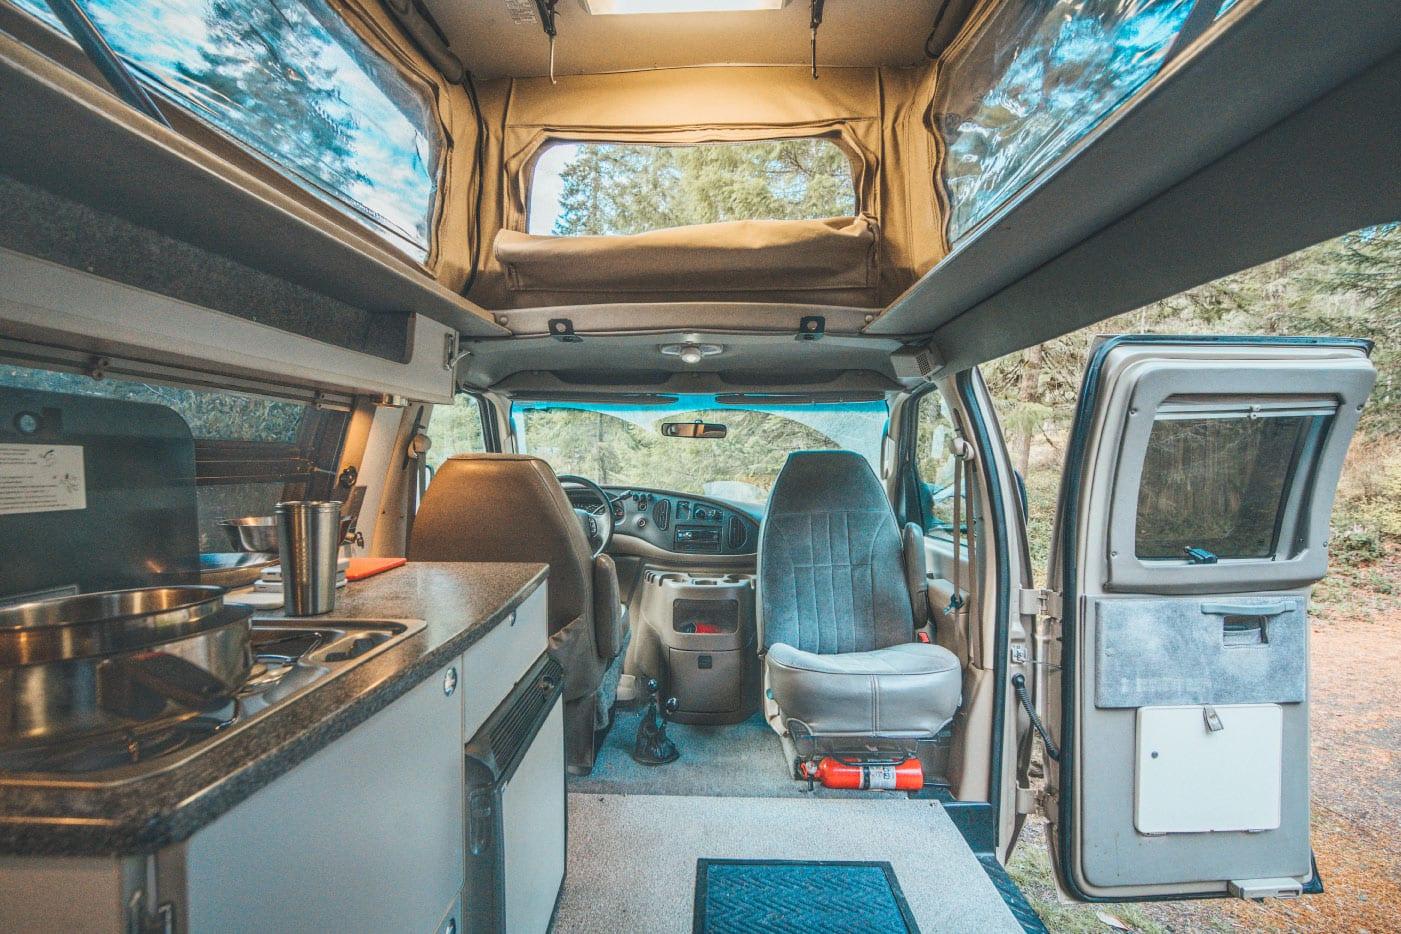 Interior of Ford E-Series 4x4 Econoline Sportsmobile EB50 Layout Campervan conversion for sale